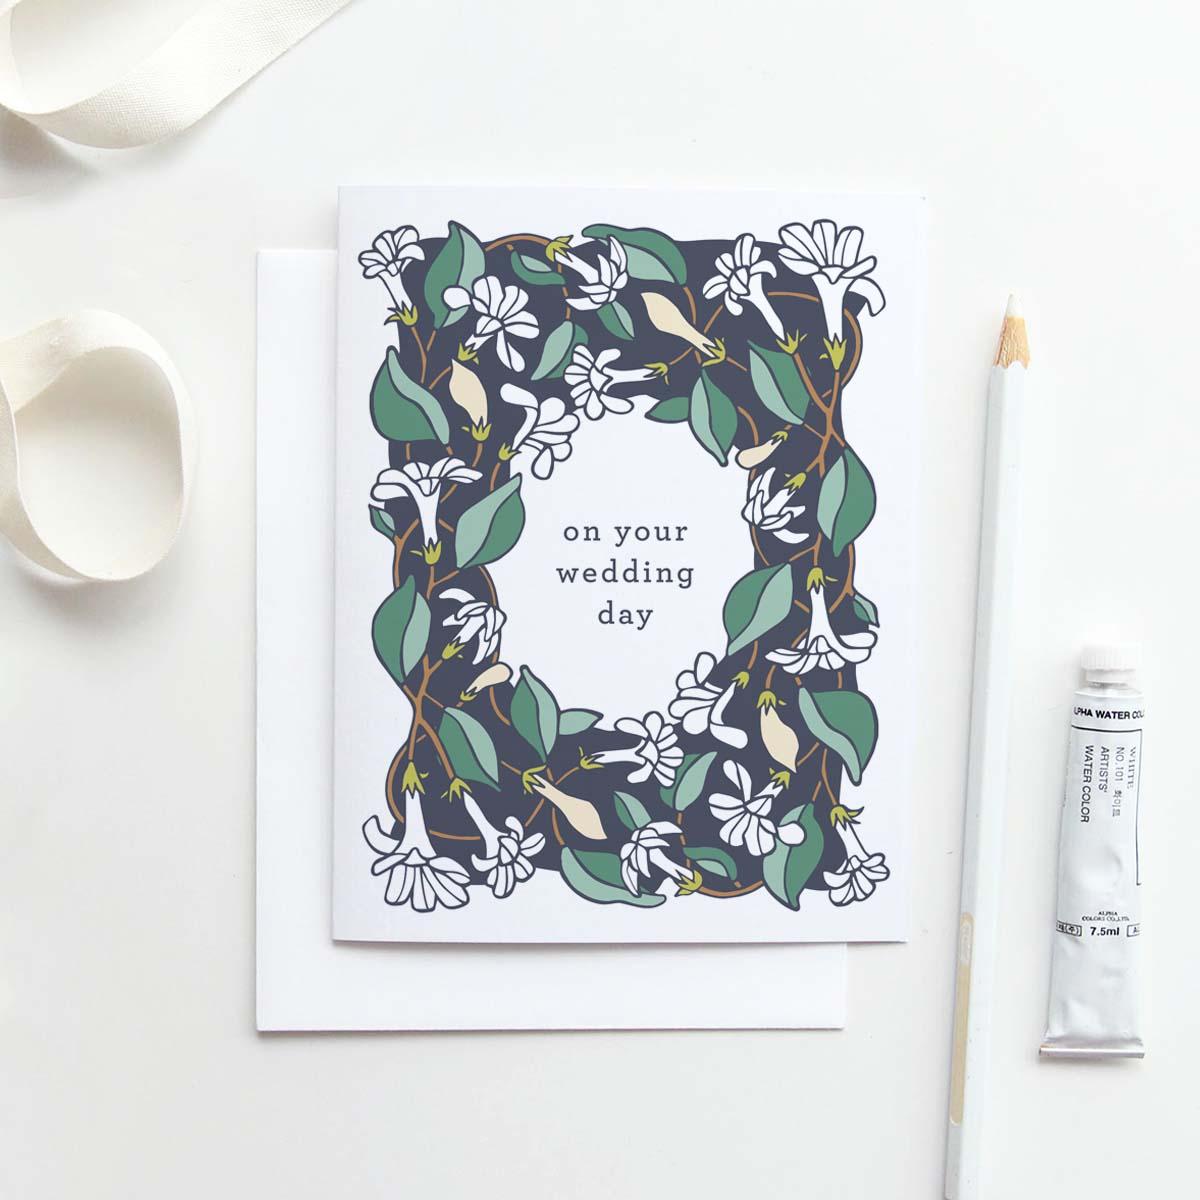 Our  Honeysuckle wedding day  card